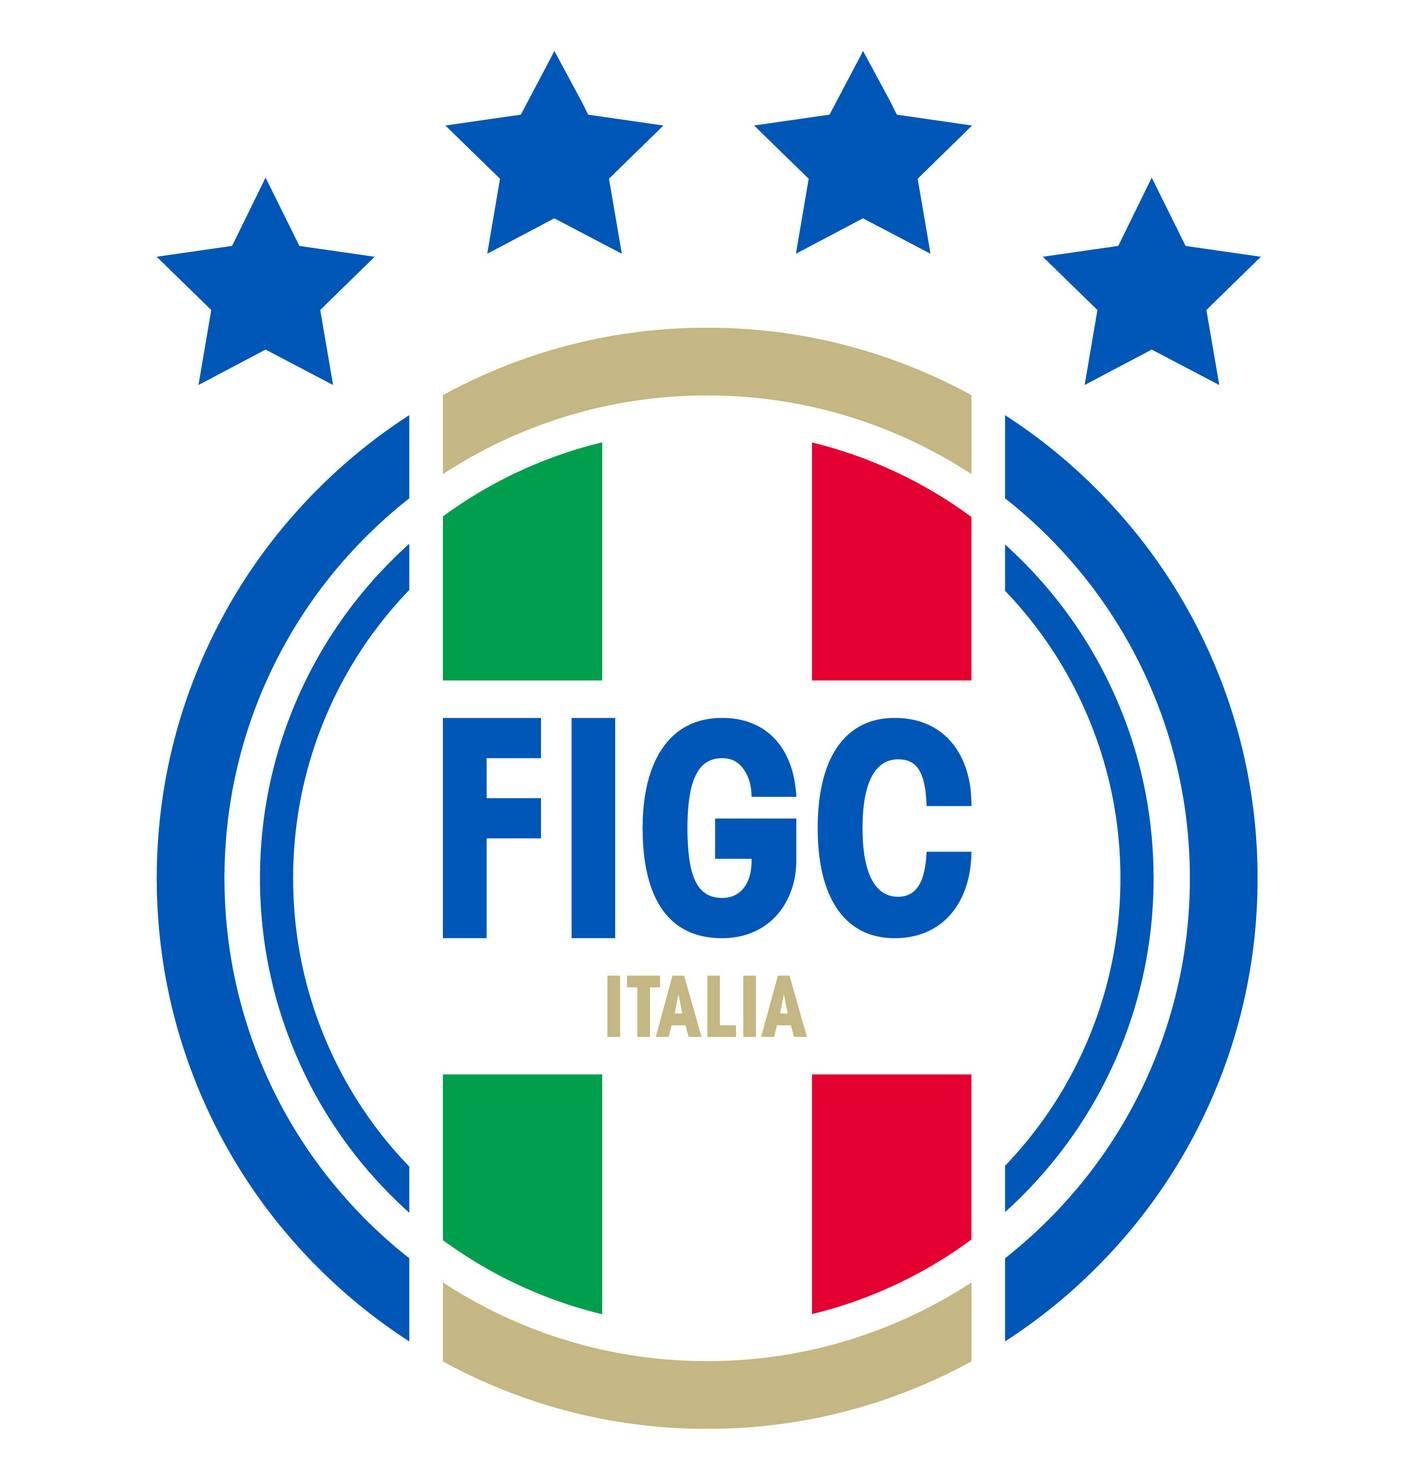 La FIGC de Italia presenta su nuevo logo institucional